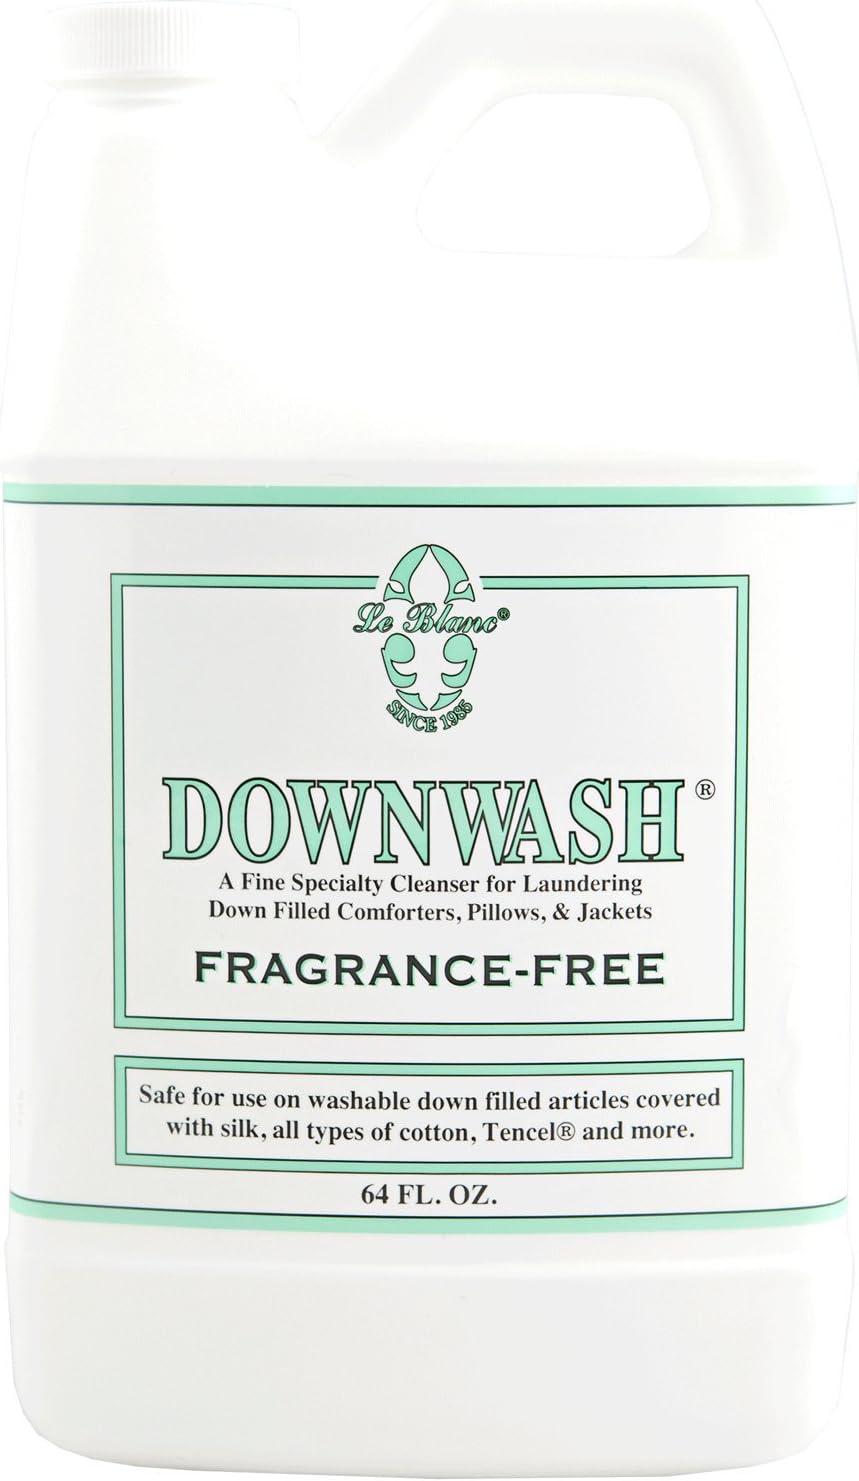 Le Blanc® Fragrance-Free Downwash® - 64 FL. OZ, One Pack